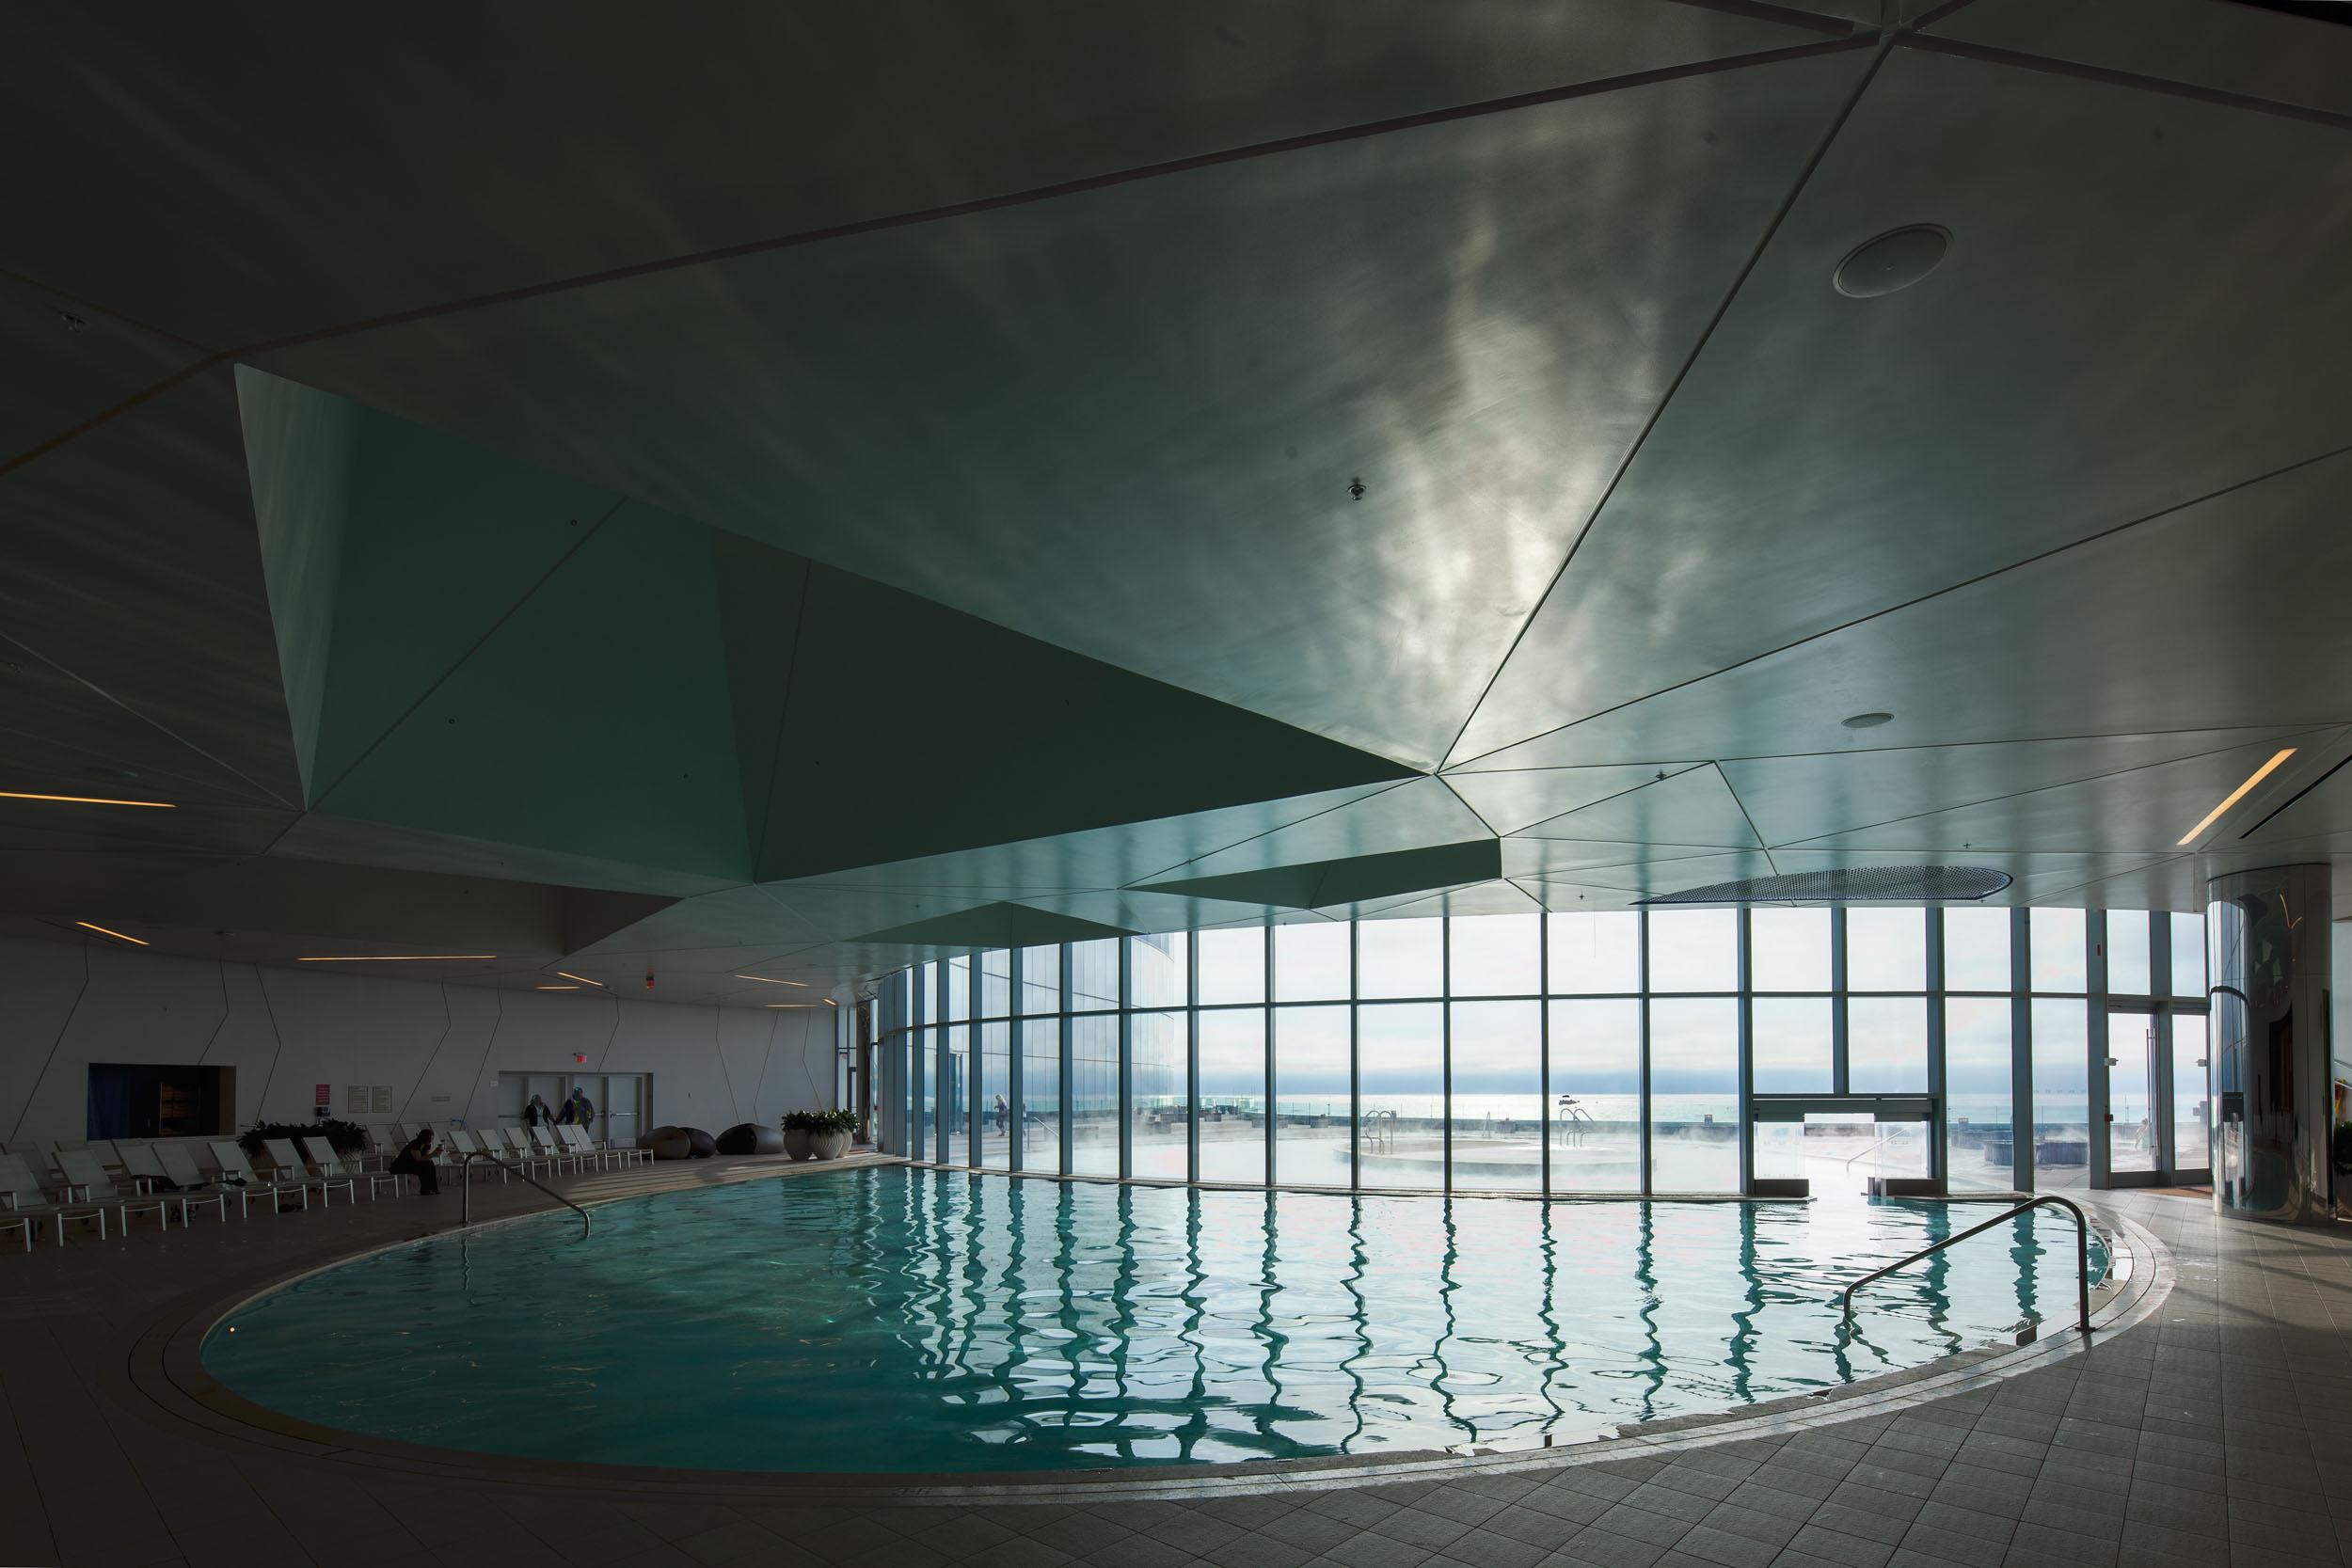 'Revel Resort' Casino, Pool